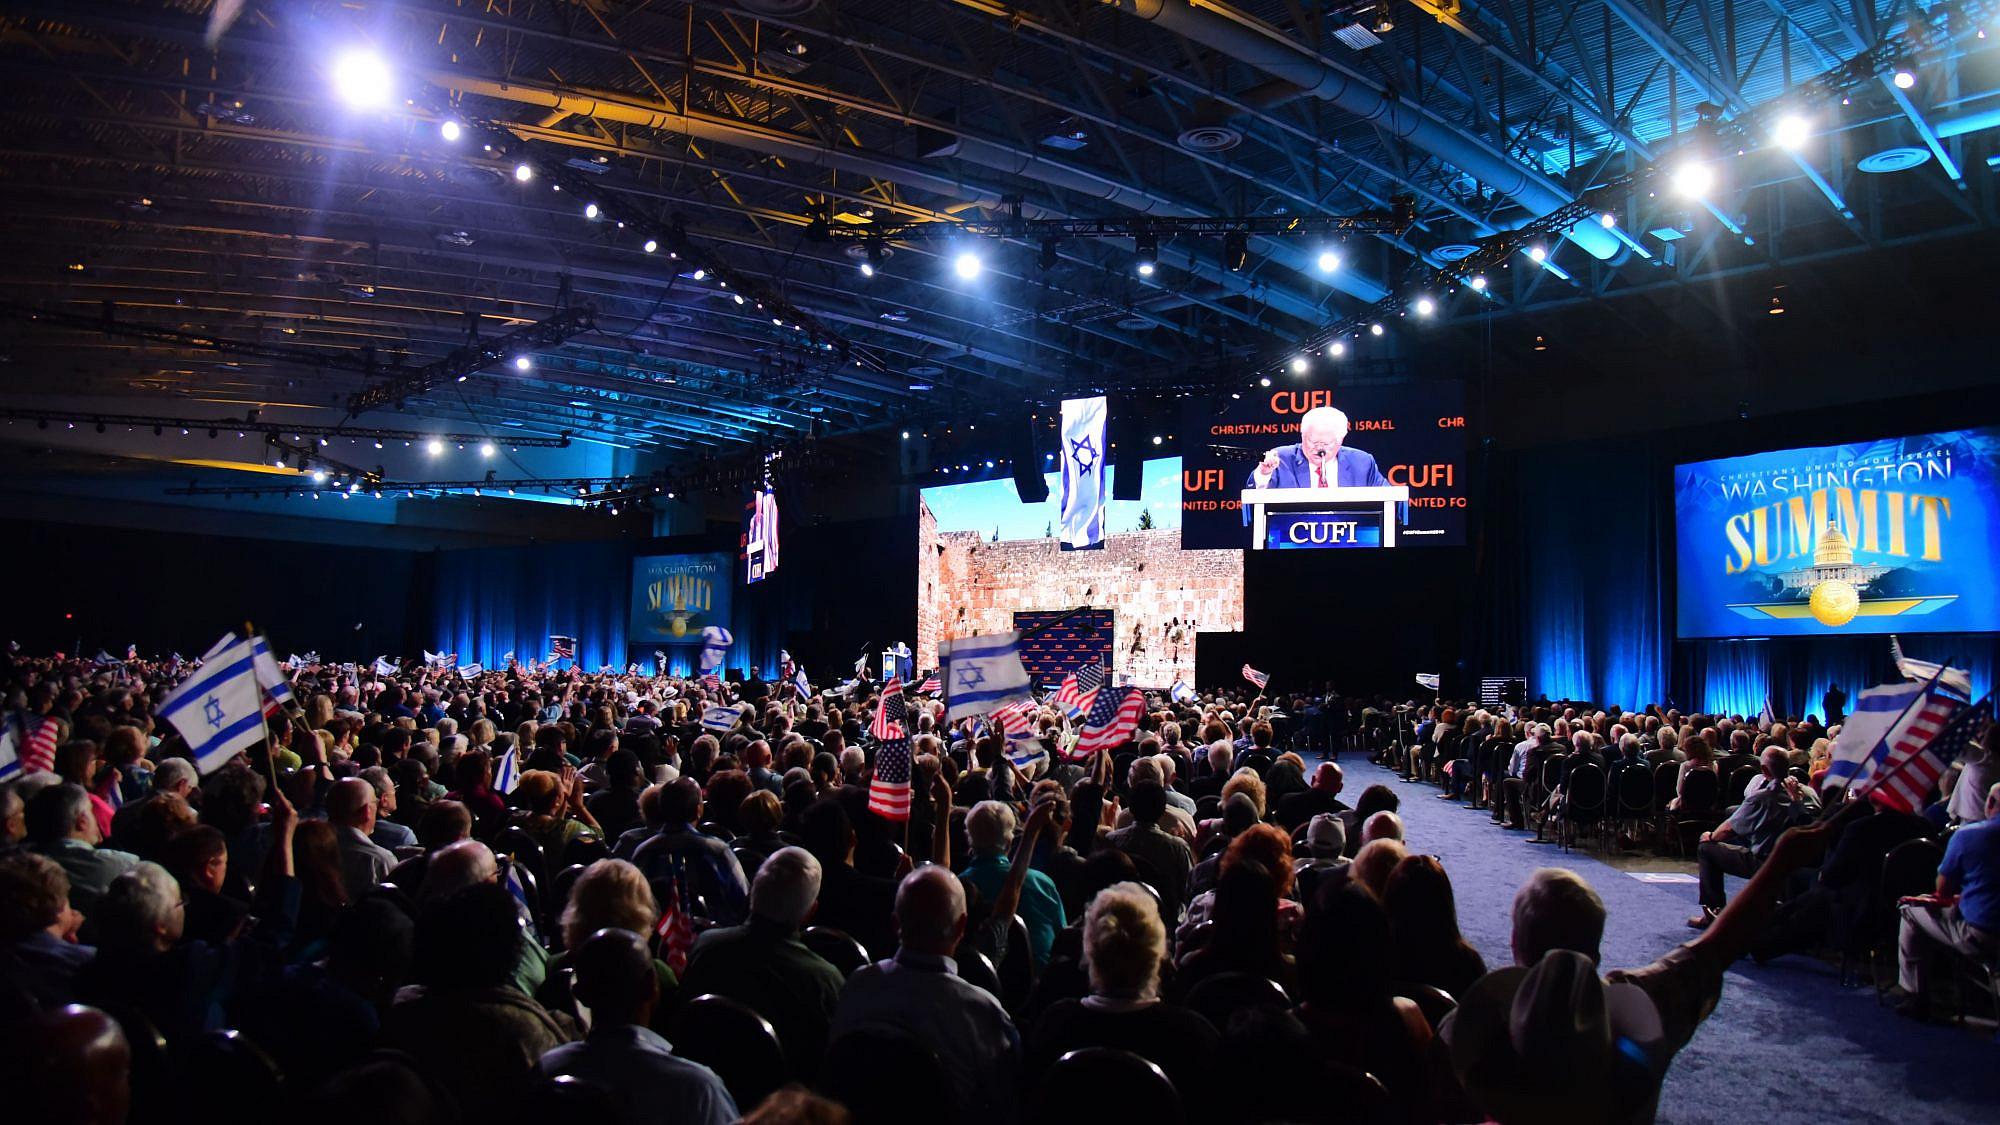 CUFI chairman Pastor John Hagee speaking at the 2019 CUFI Washington Summit. Credit: Courtesy.